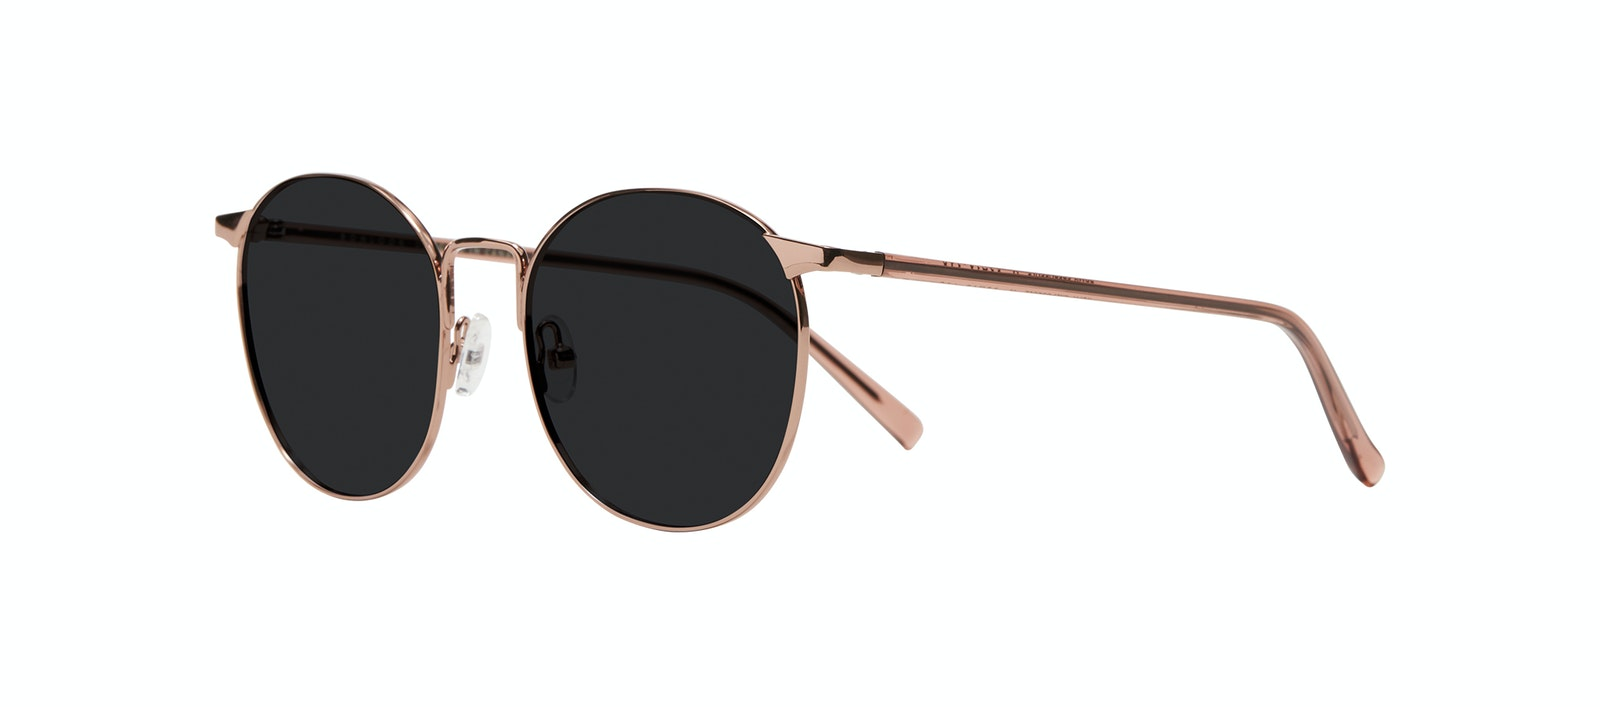 Affordable Fashion Glasses Round Sunglasses Women Romy Petite Crepuscule Tilt